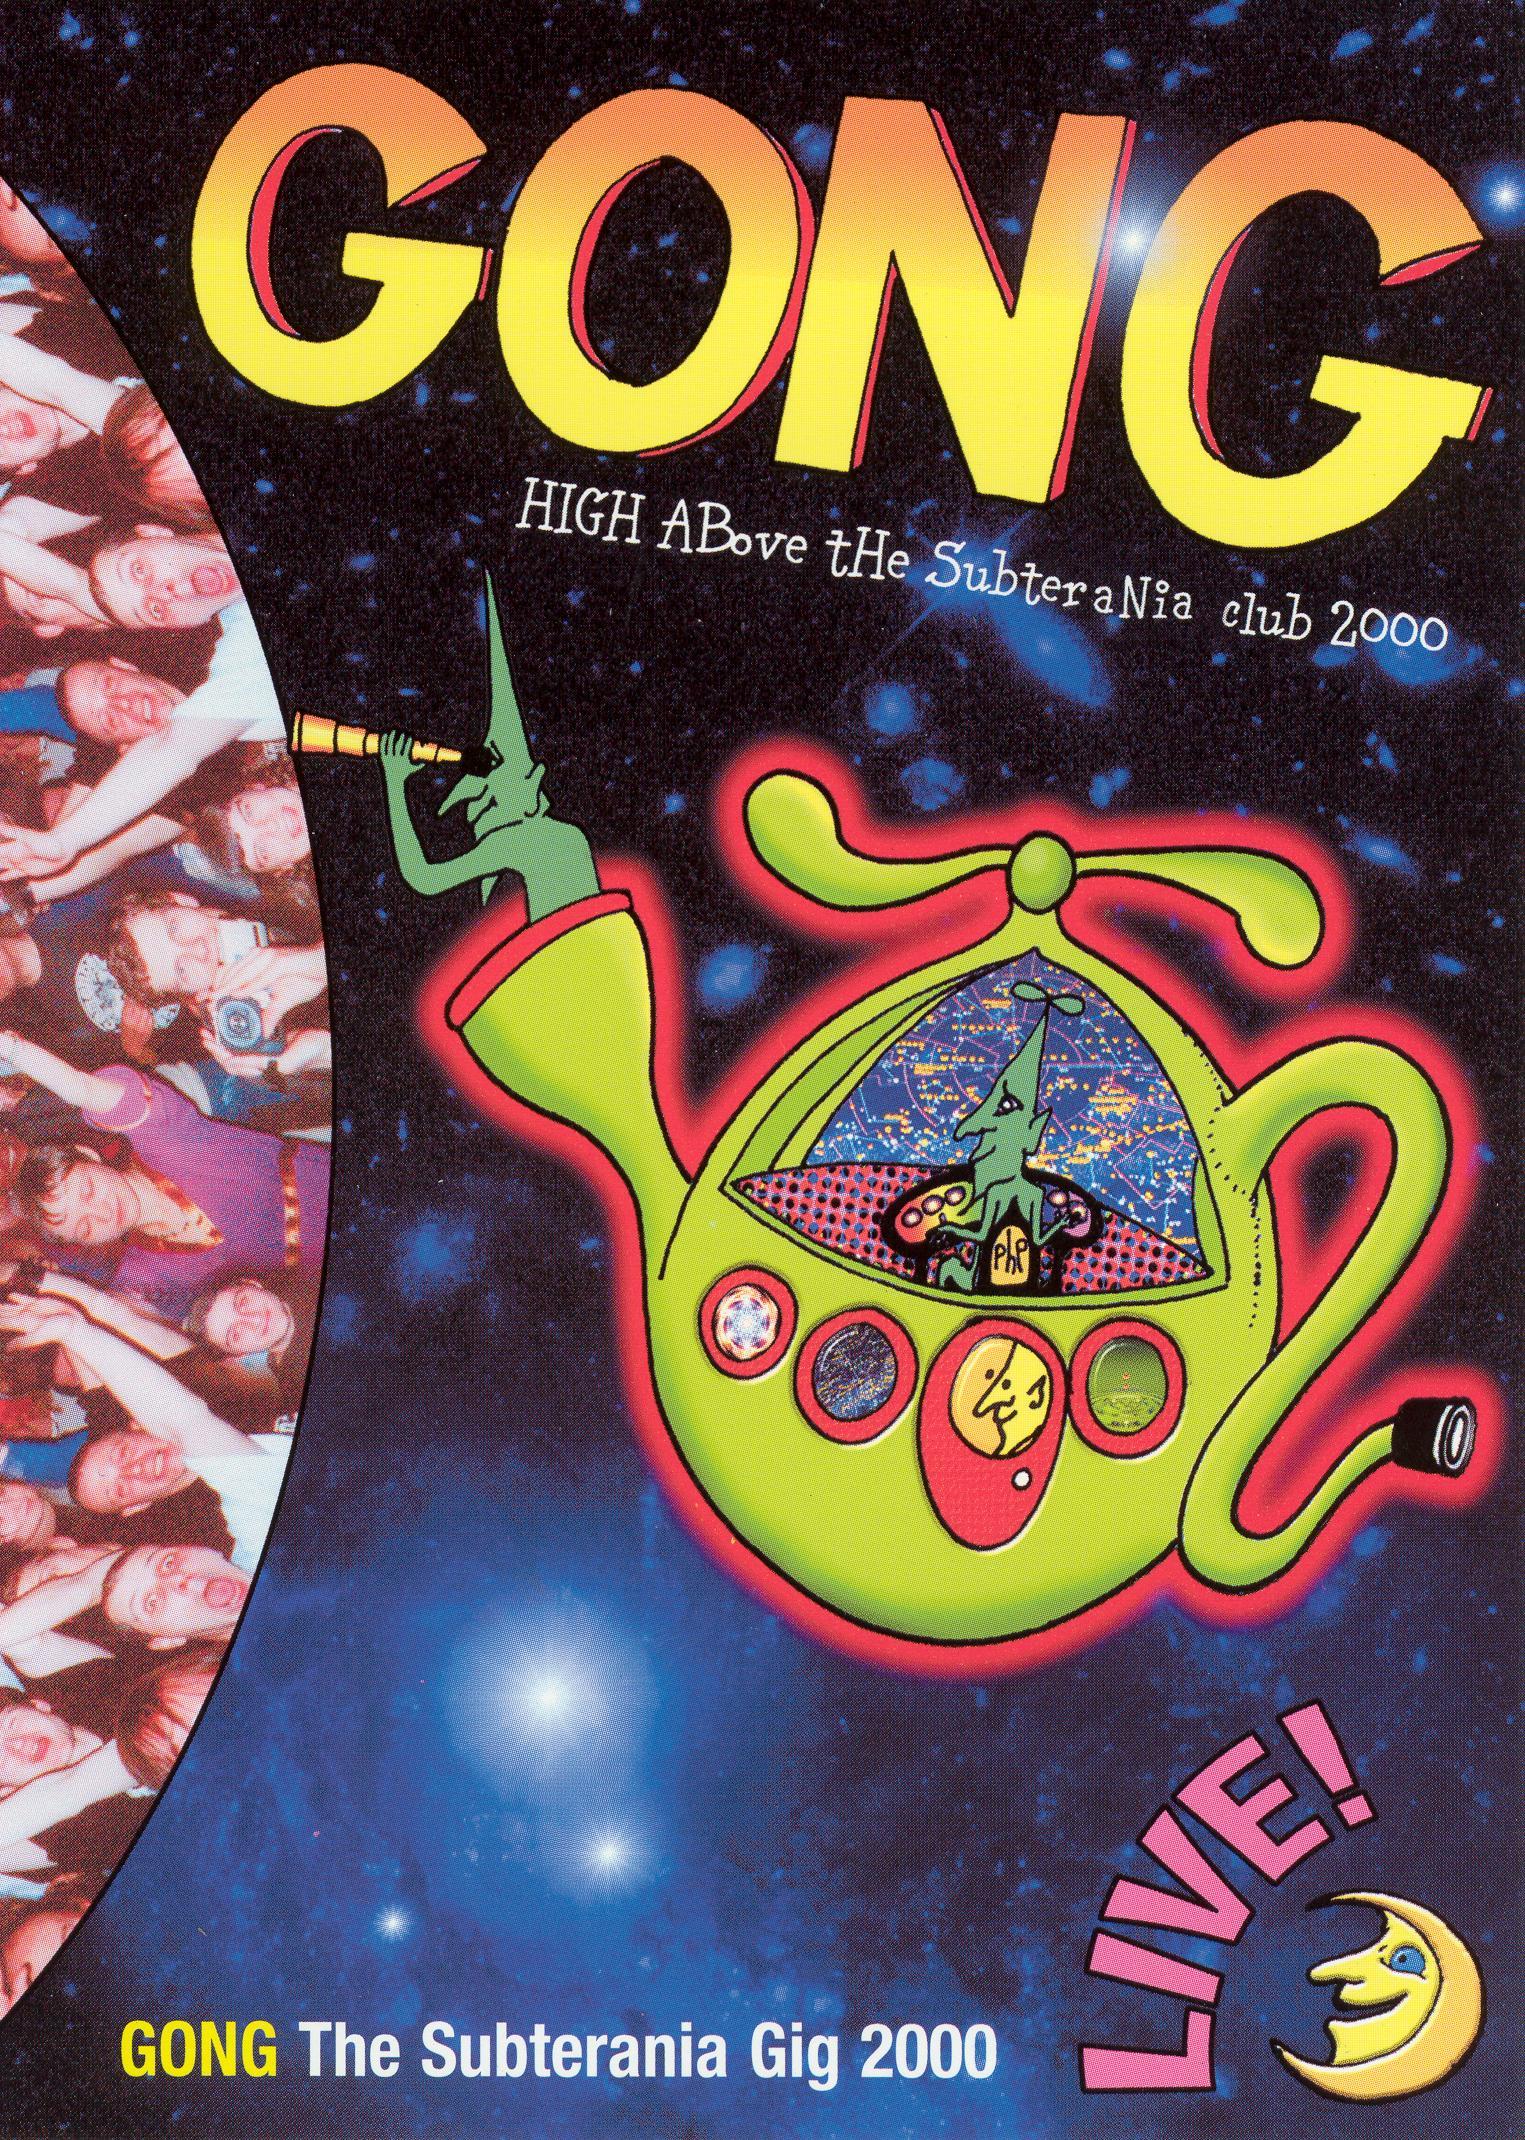 Gong: High Above the Subterranea Club 2000